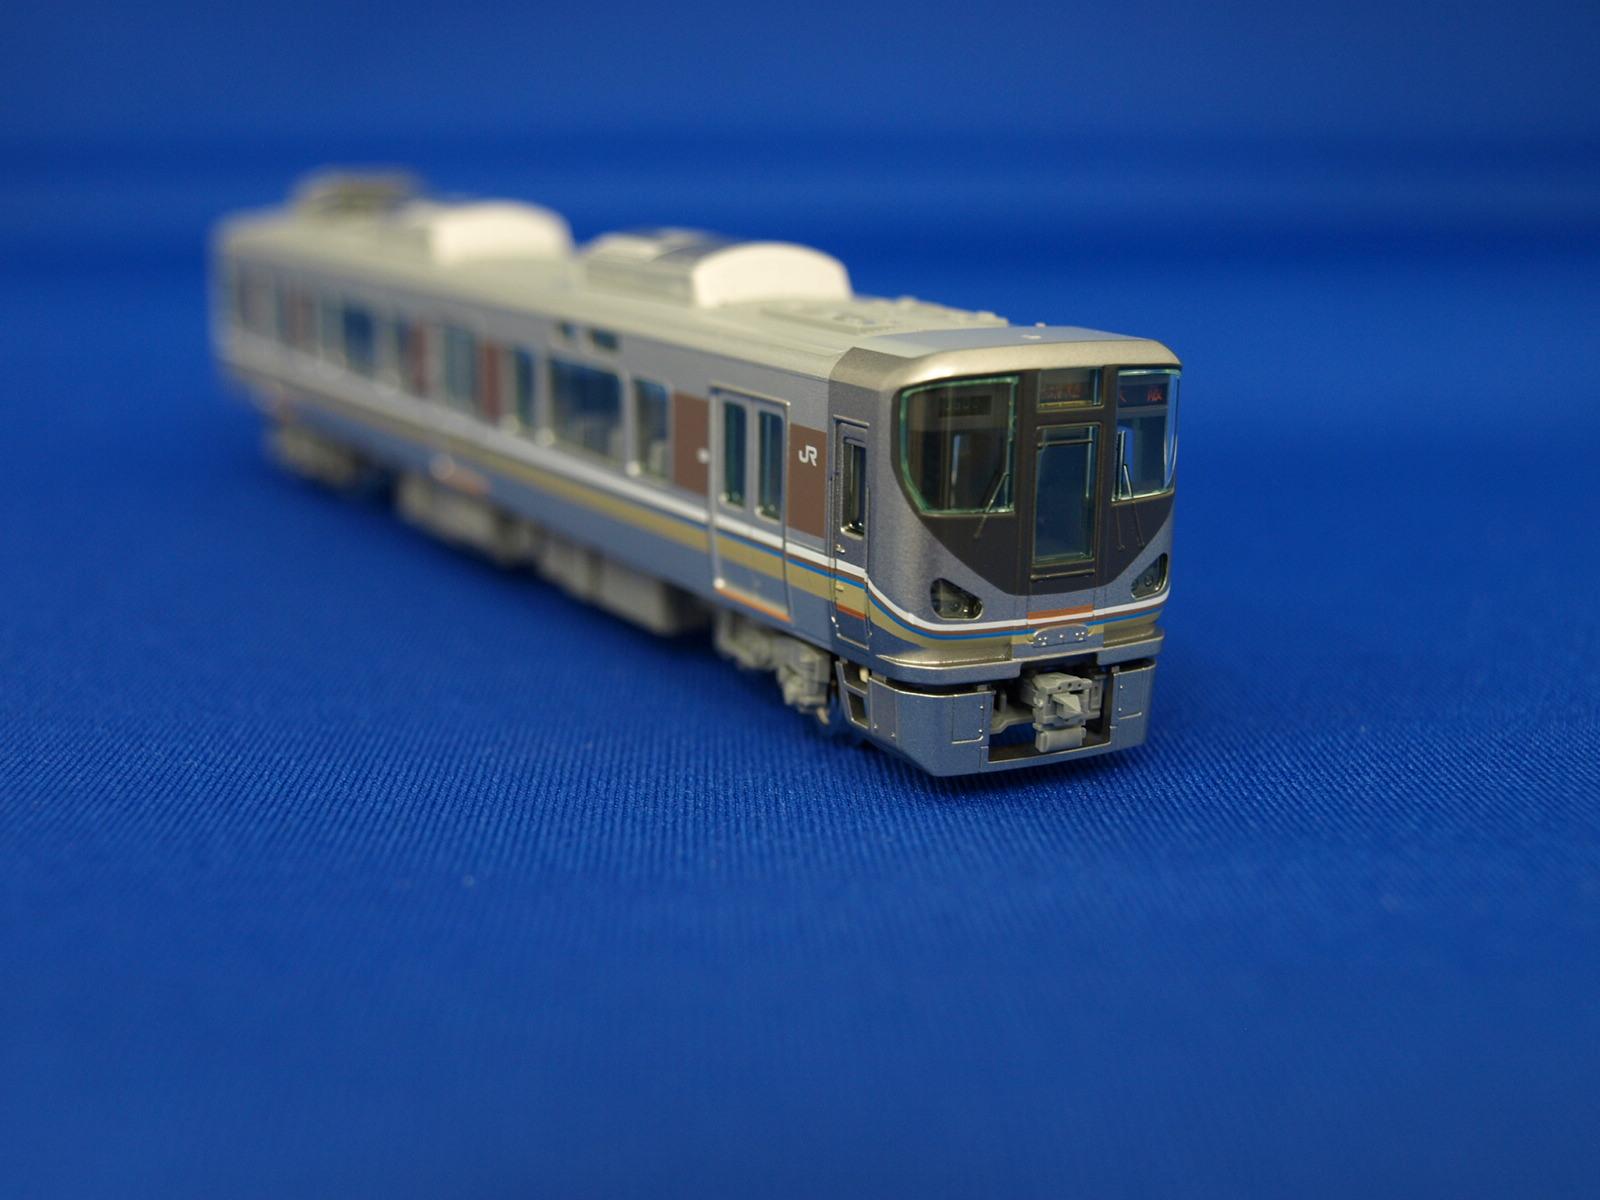 Nゲージ トミックス 98607 JR 225-6000系近郊電車(4両編成)セット